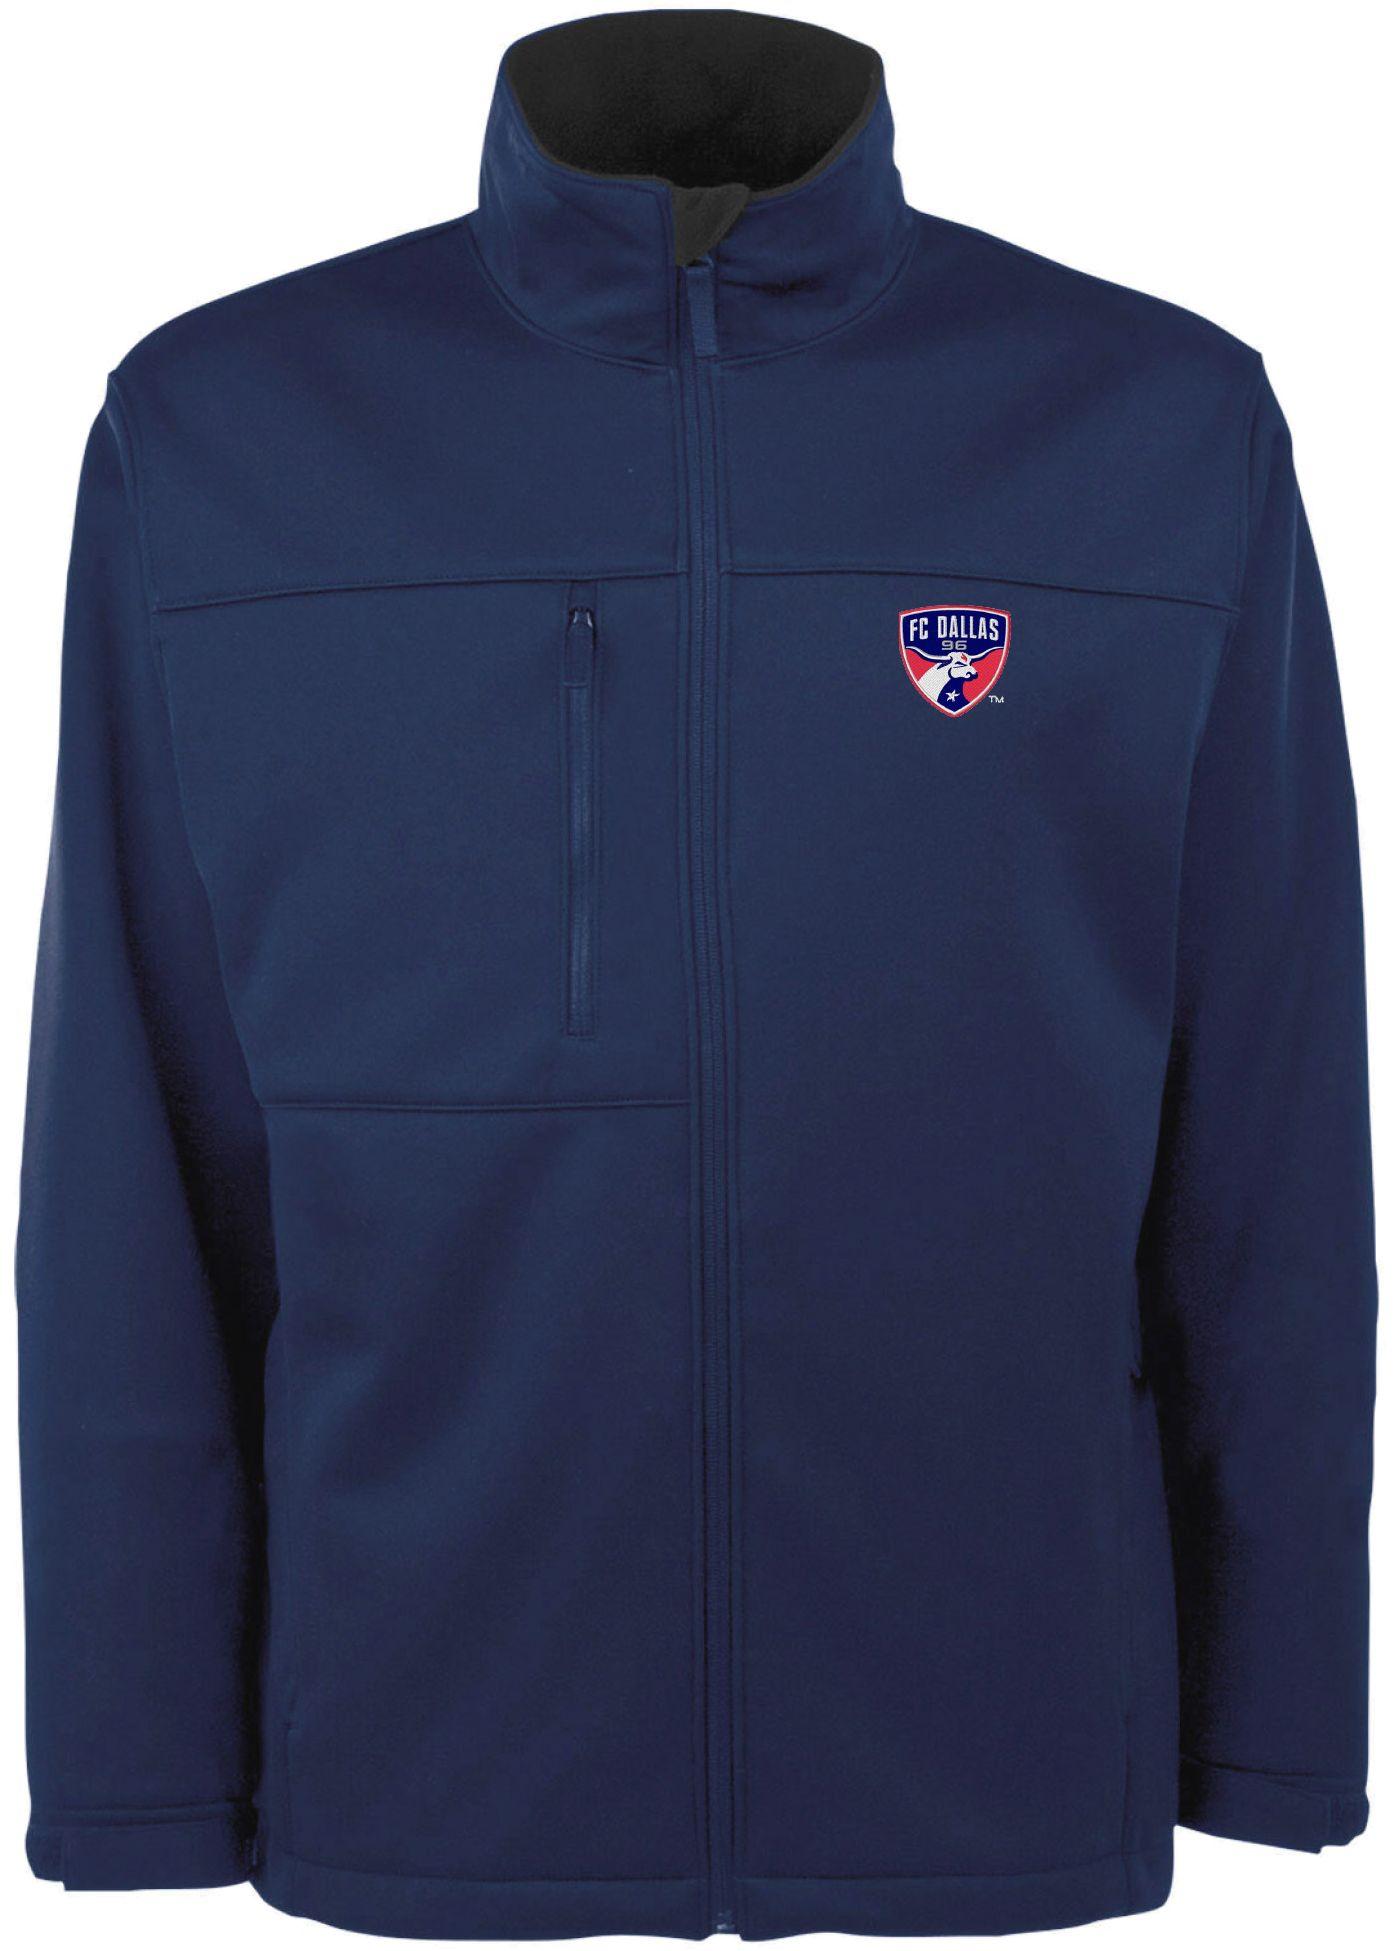 Antigua Men's FC Dallas Traverse Navy Soft-Shell Full-Zip Jacket